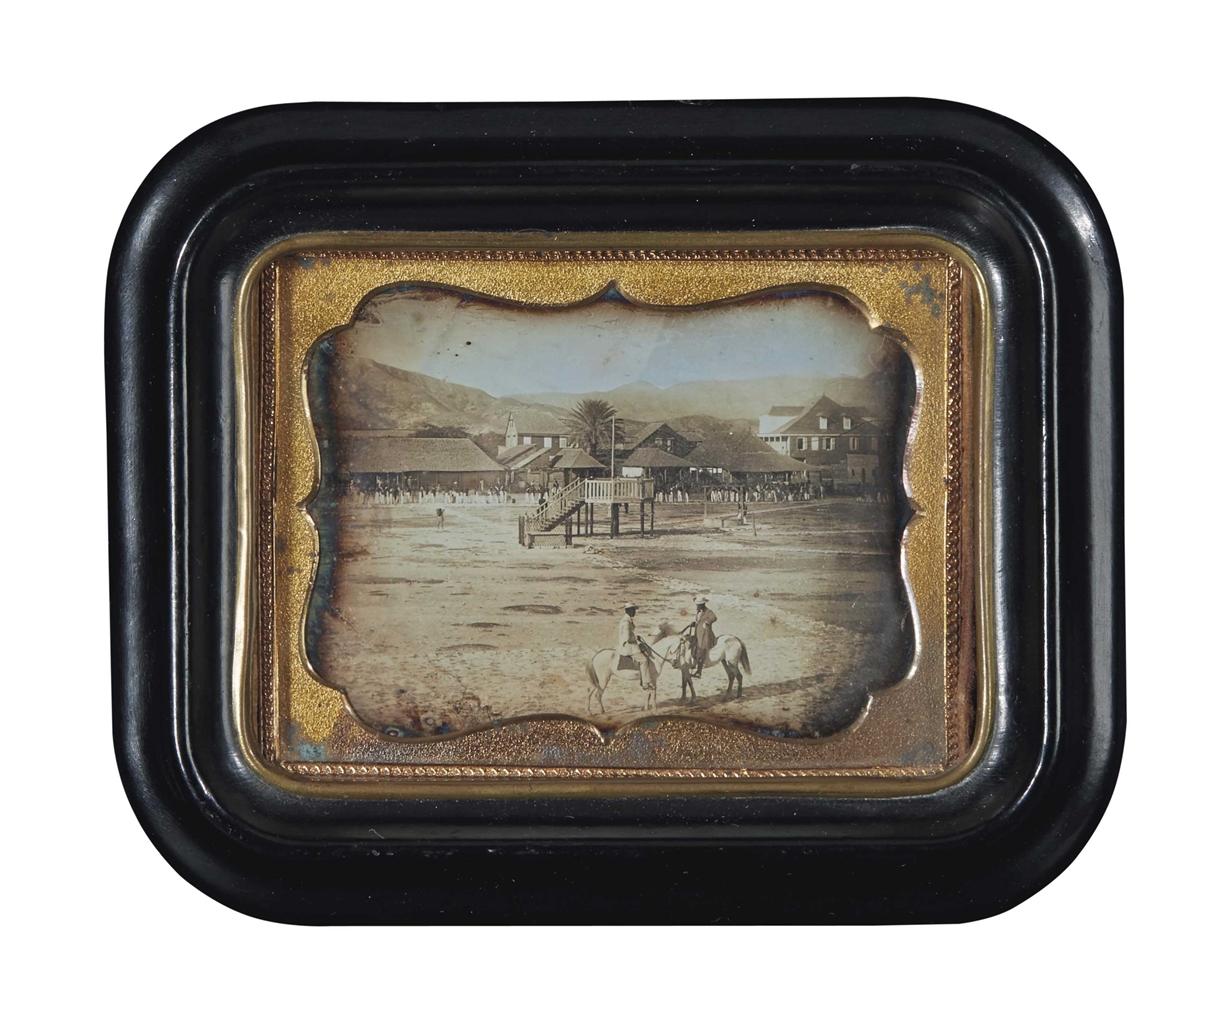 Photographer Unknown - Sans titre (Parade ground)-1860